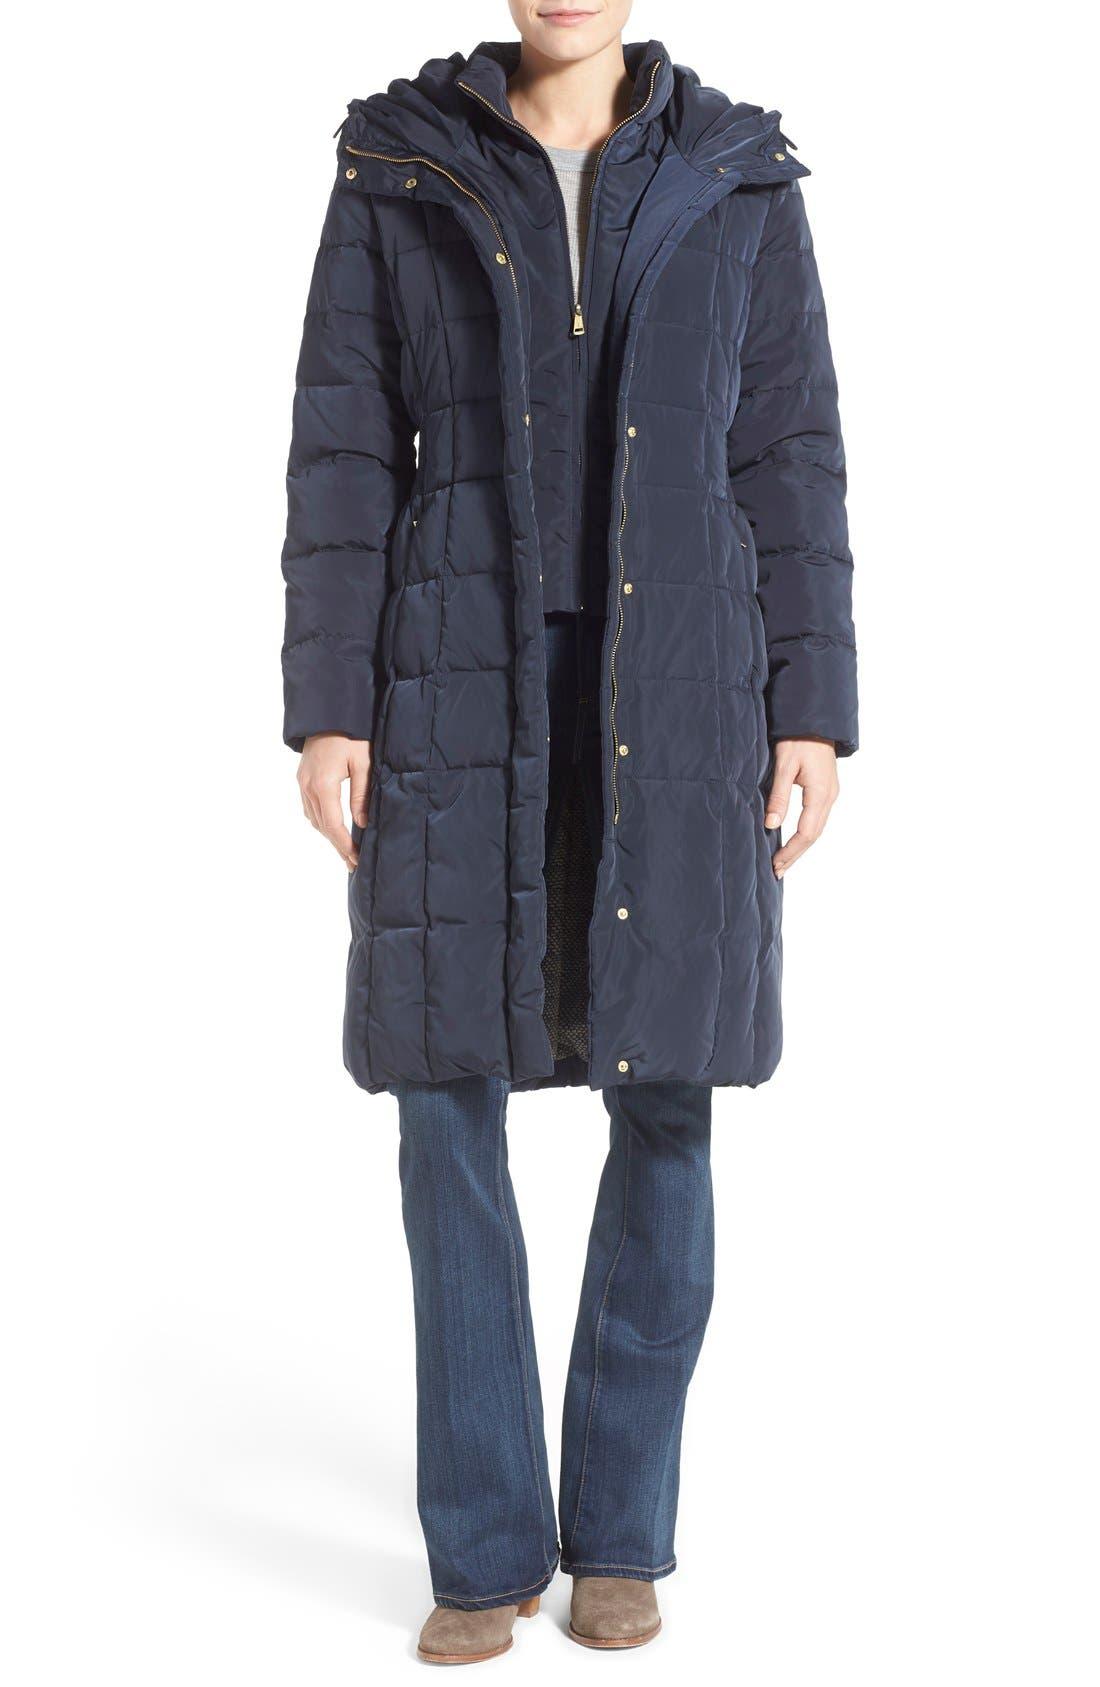 Womens parka jacket with hood